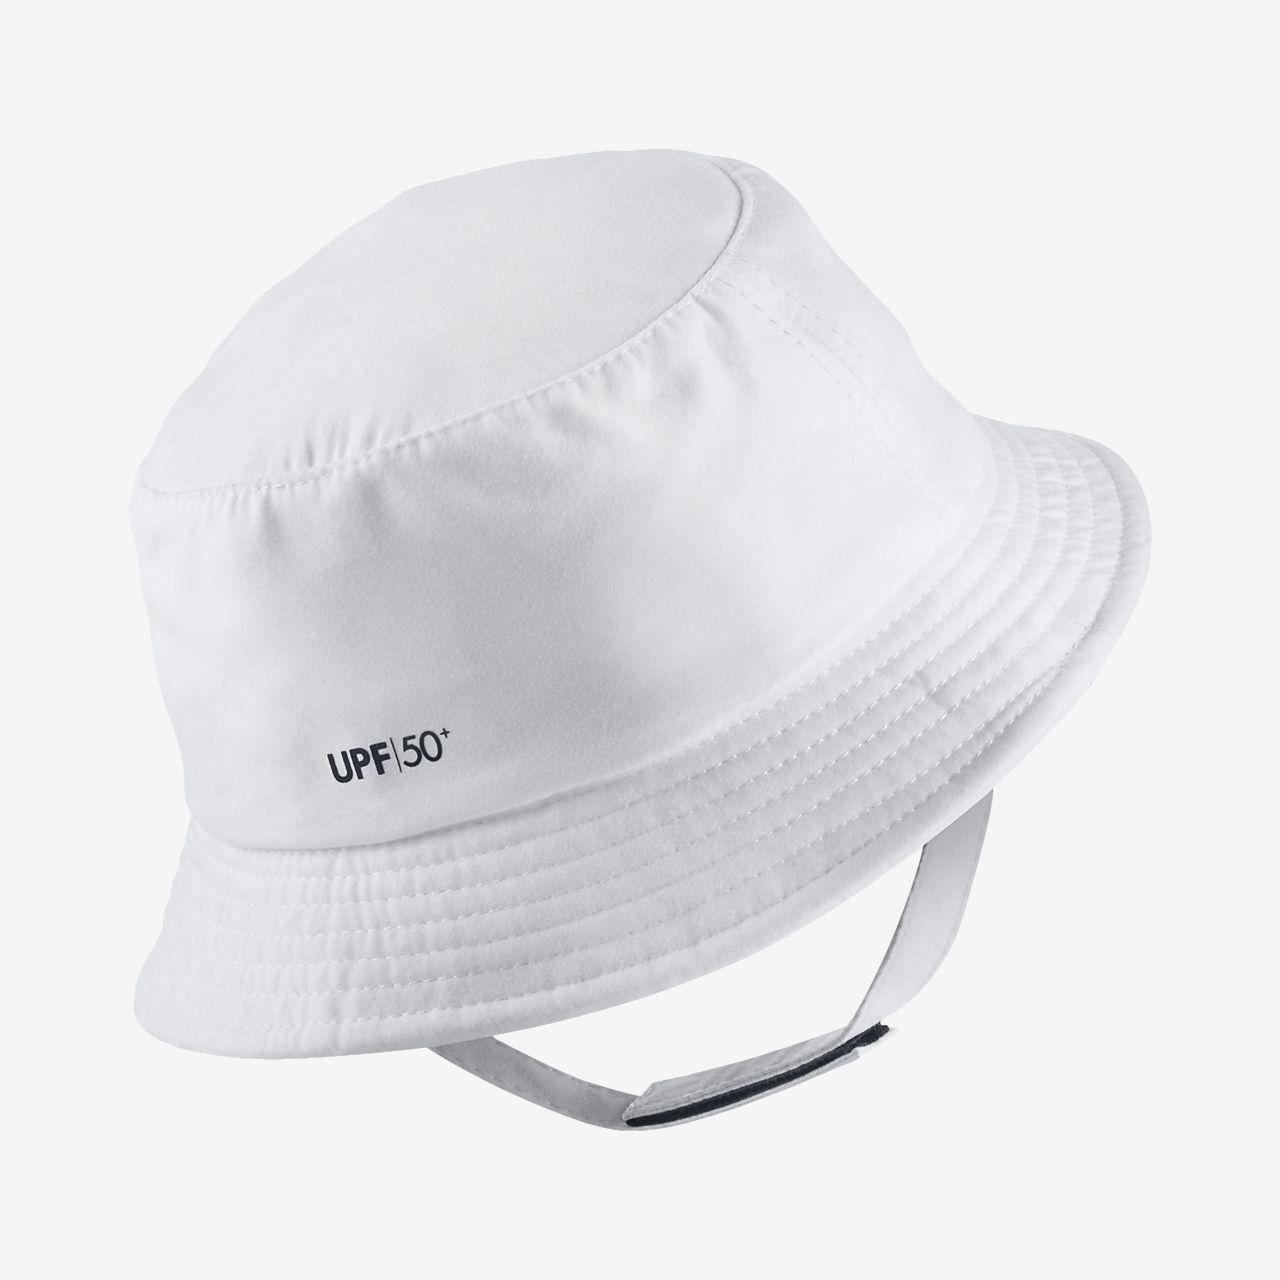 615d8e879270e Nike Dri-FIT Baby Bucket Hat. Nike.com GB